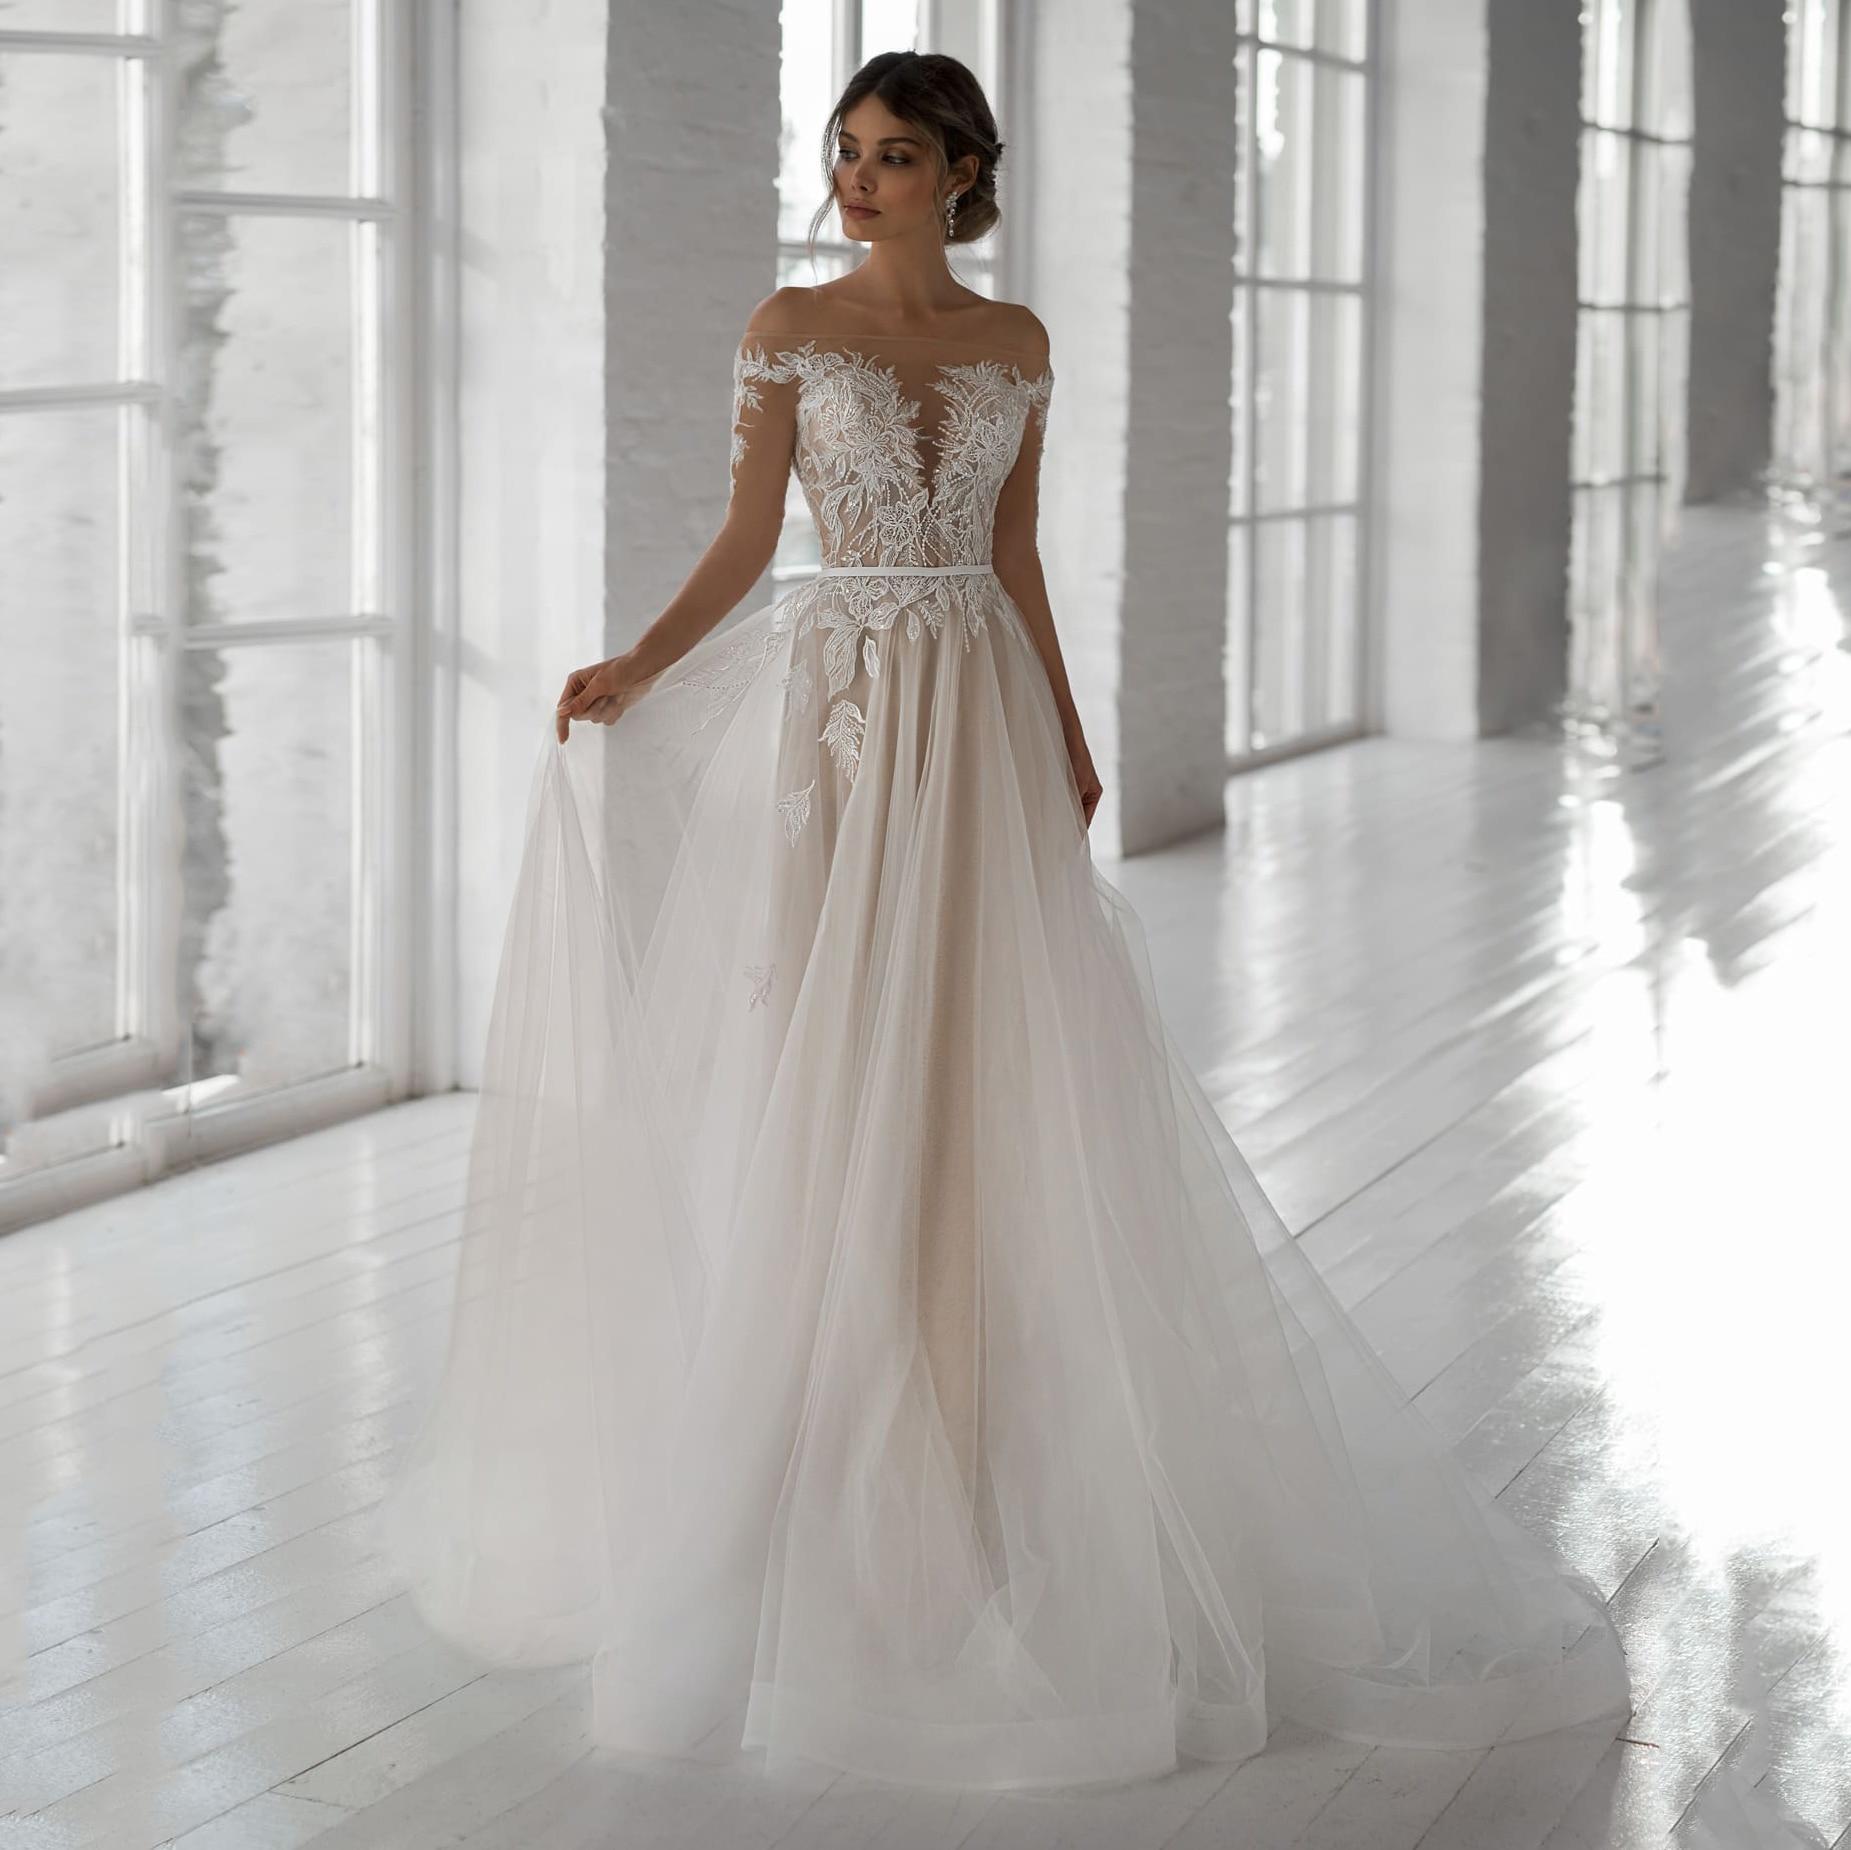 Elegant Champagne Wedding Dresses Long Sleeve Lace Applique A-line Bridal Gown